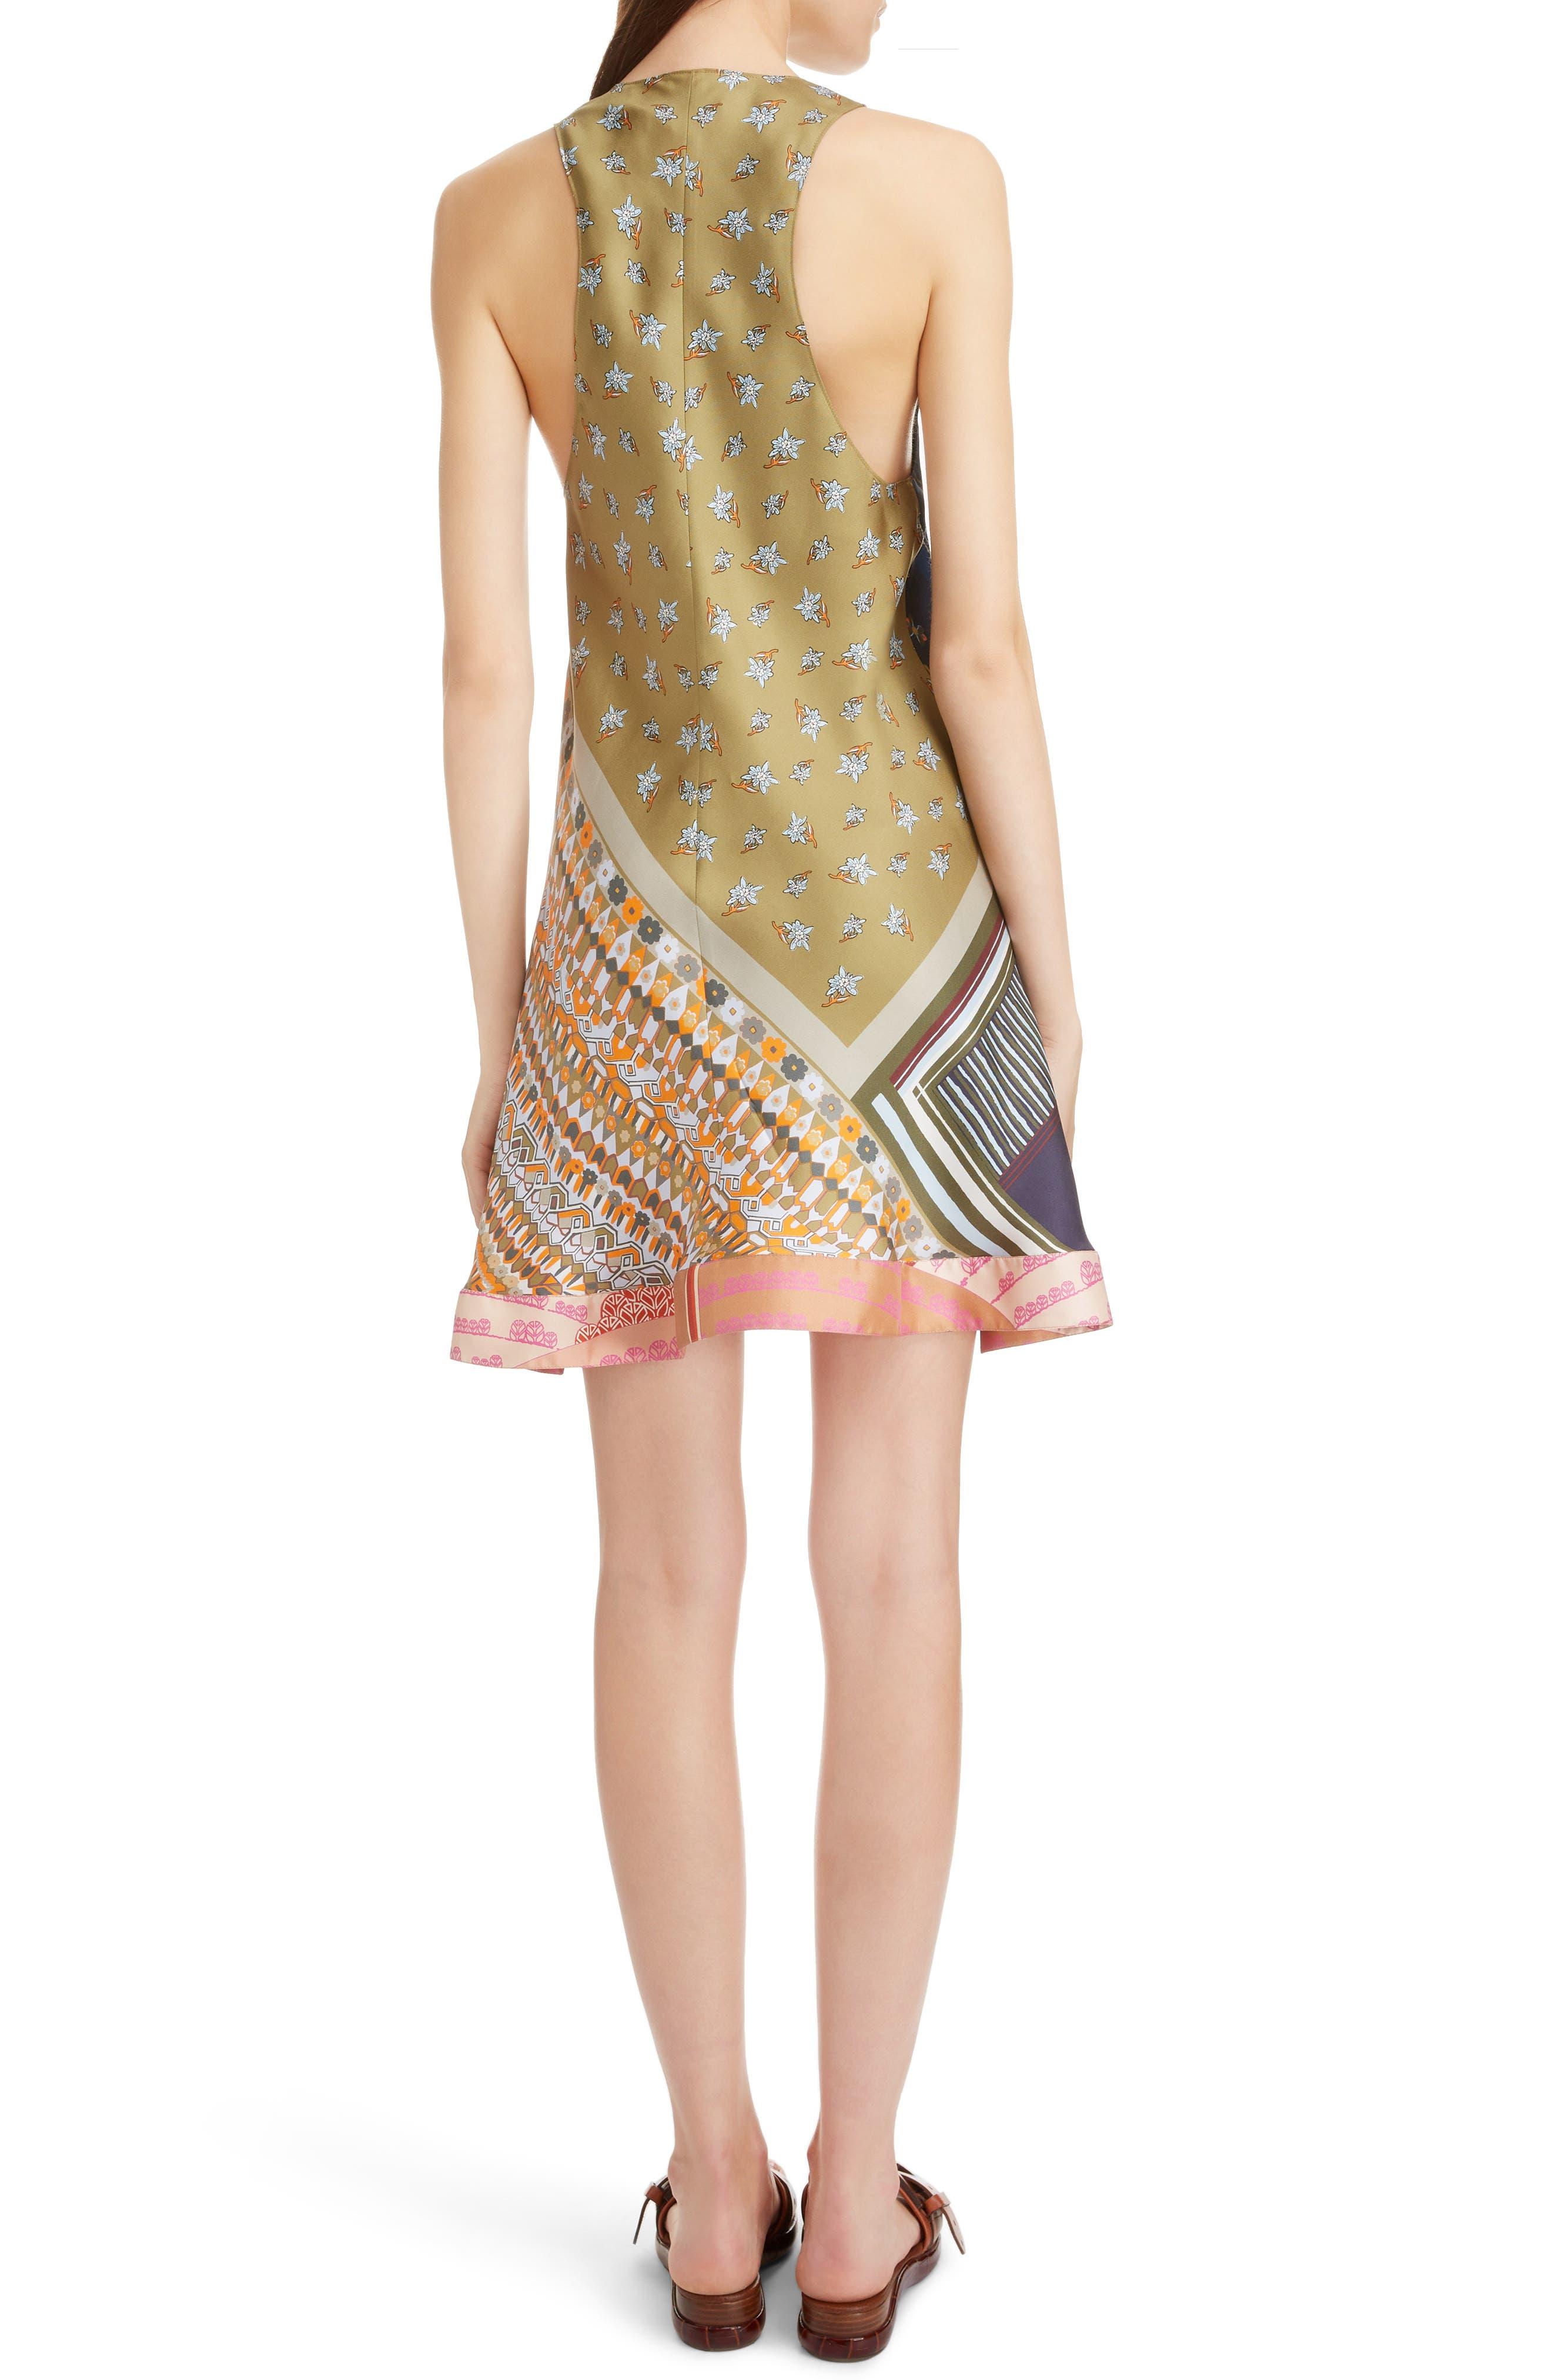 CHLOÉ,                             Caravan Print Silk Racerback Dress,                             Alternate thumbnail 2, color,                             MULTICOLOR BLUE